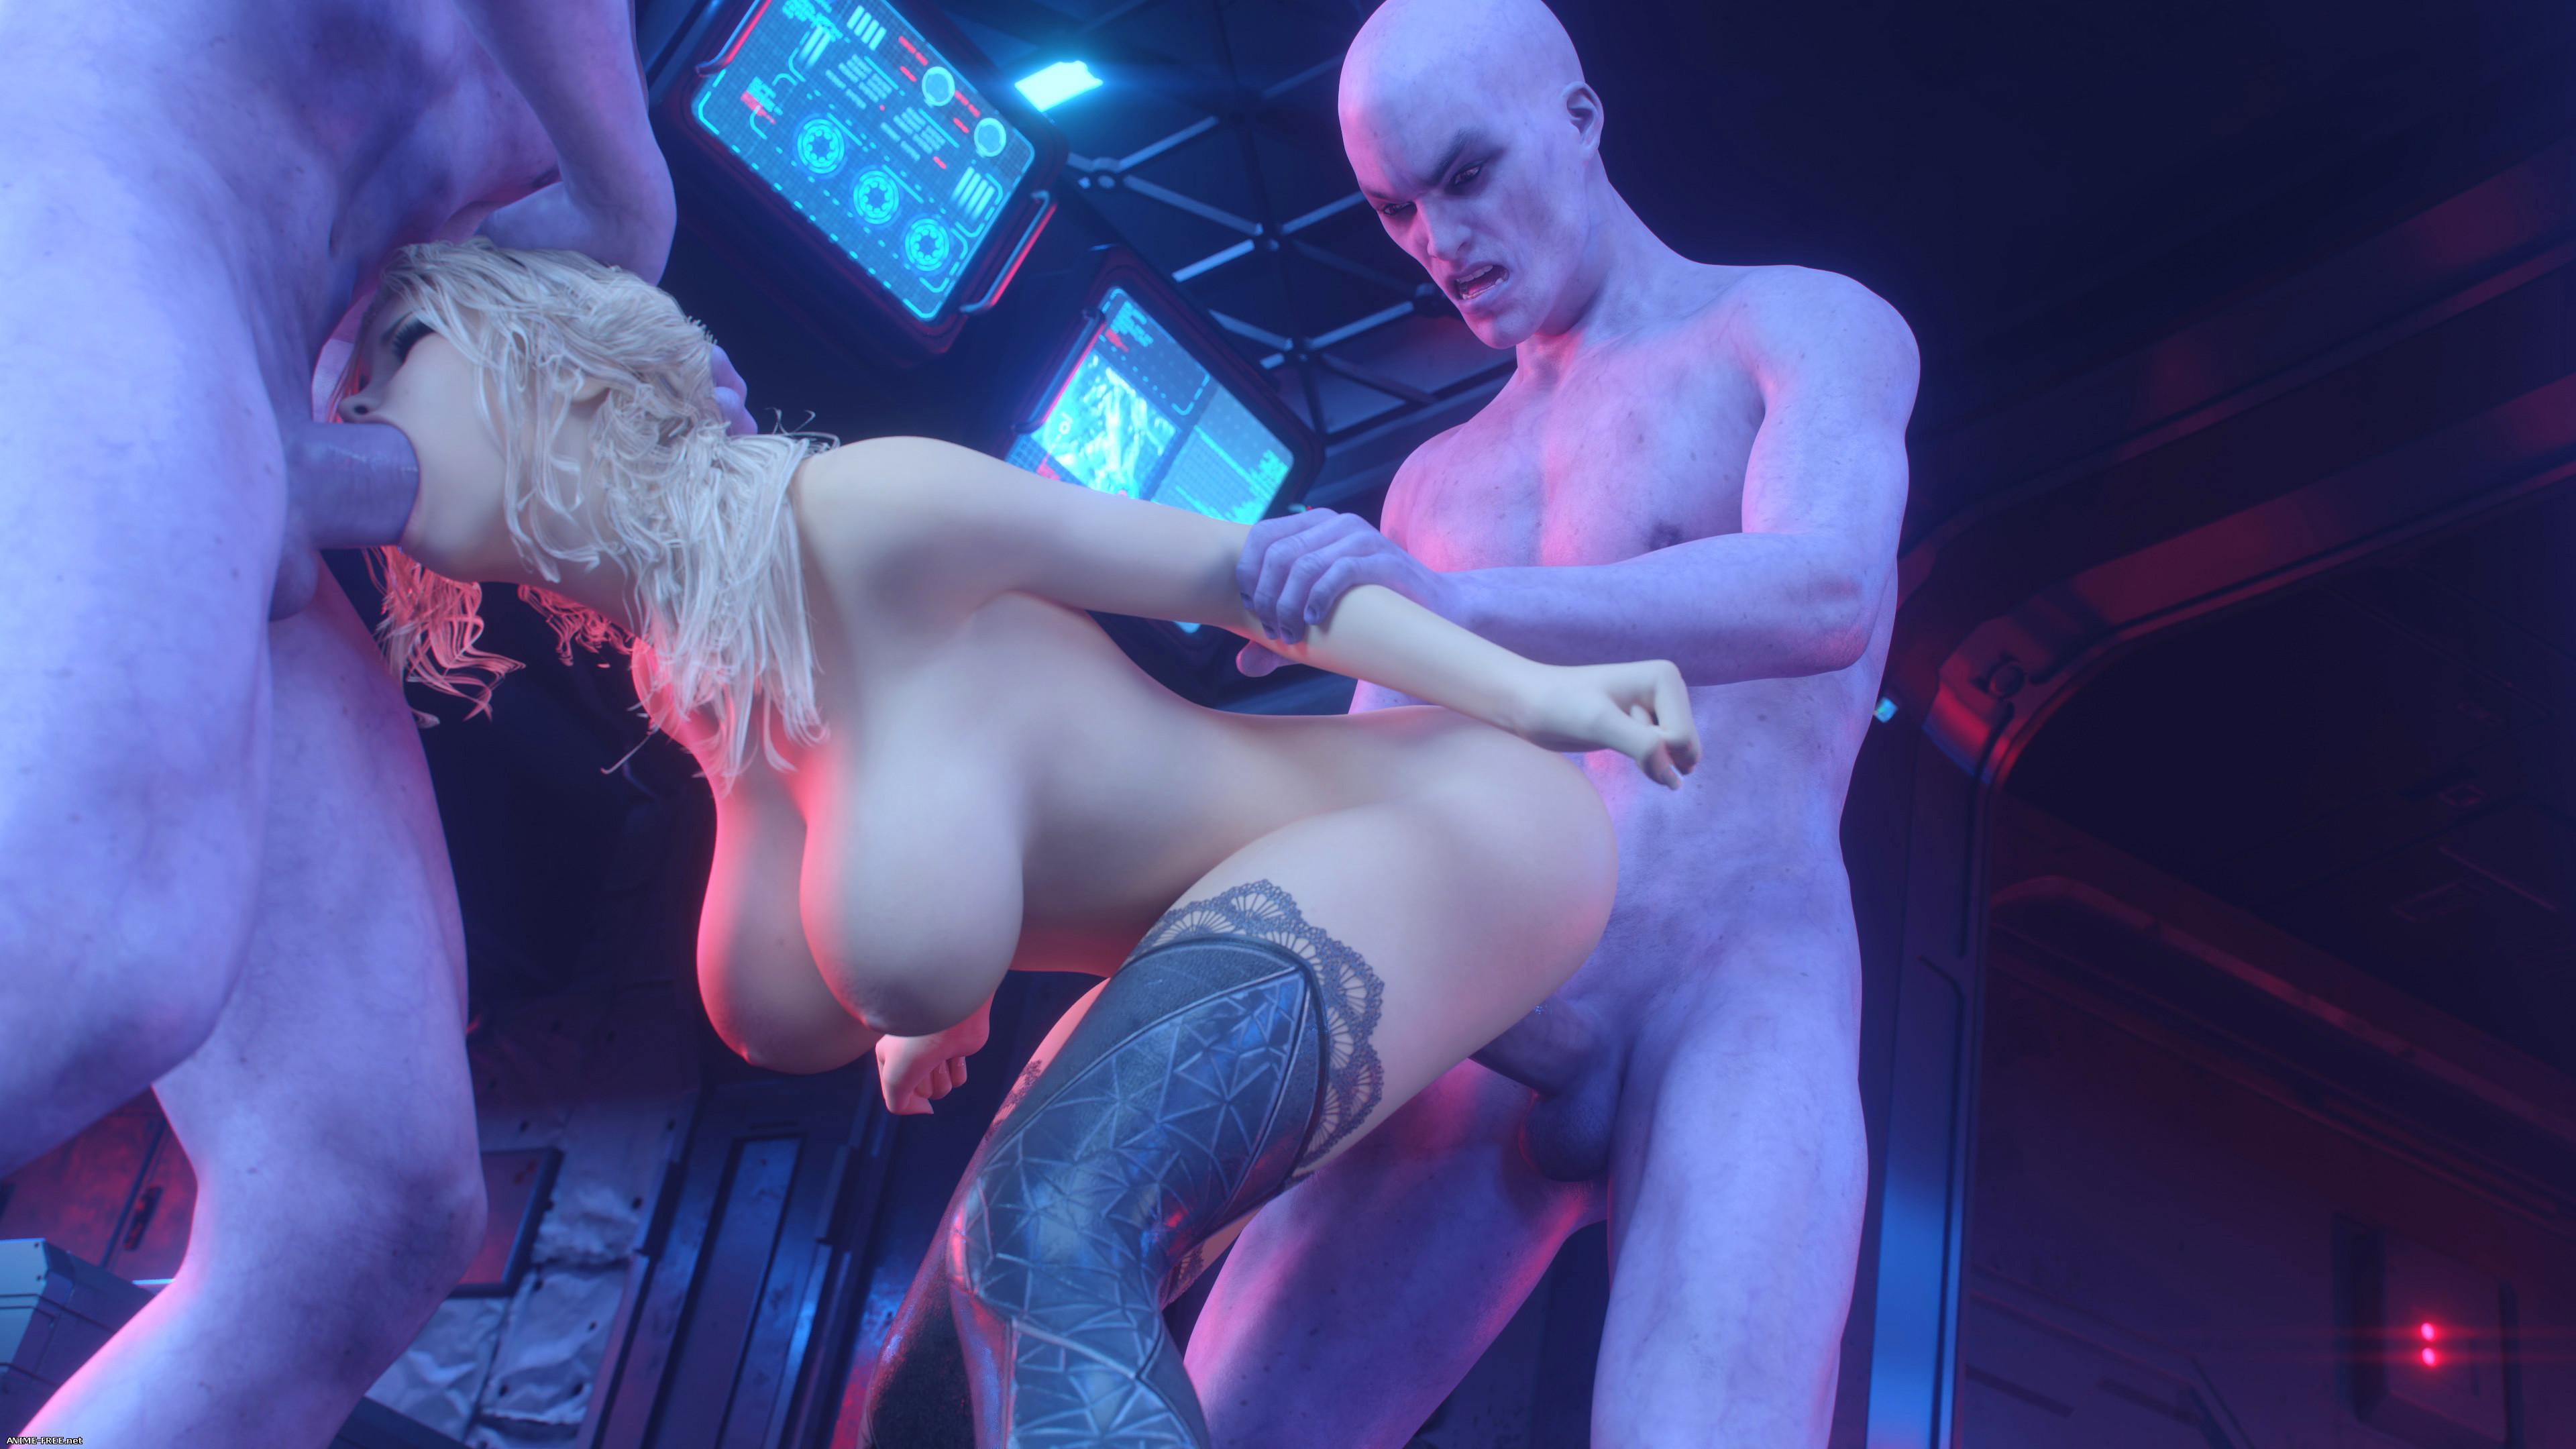 Danger Zone 2 [3DCG] [Uncen] [No-Text] Porn Comics